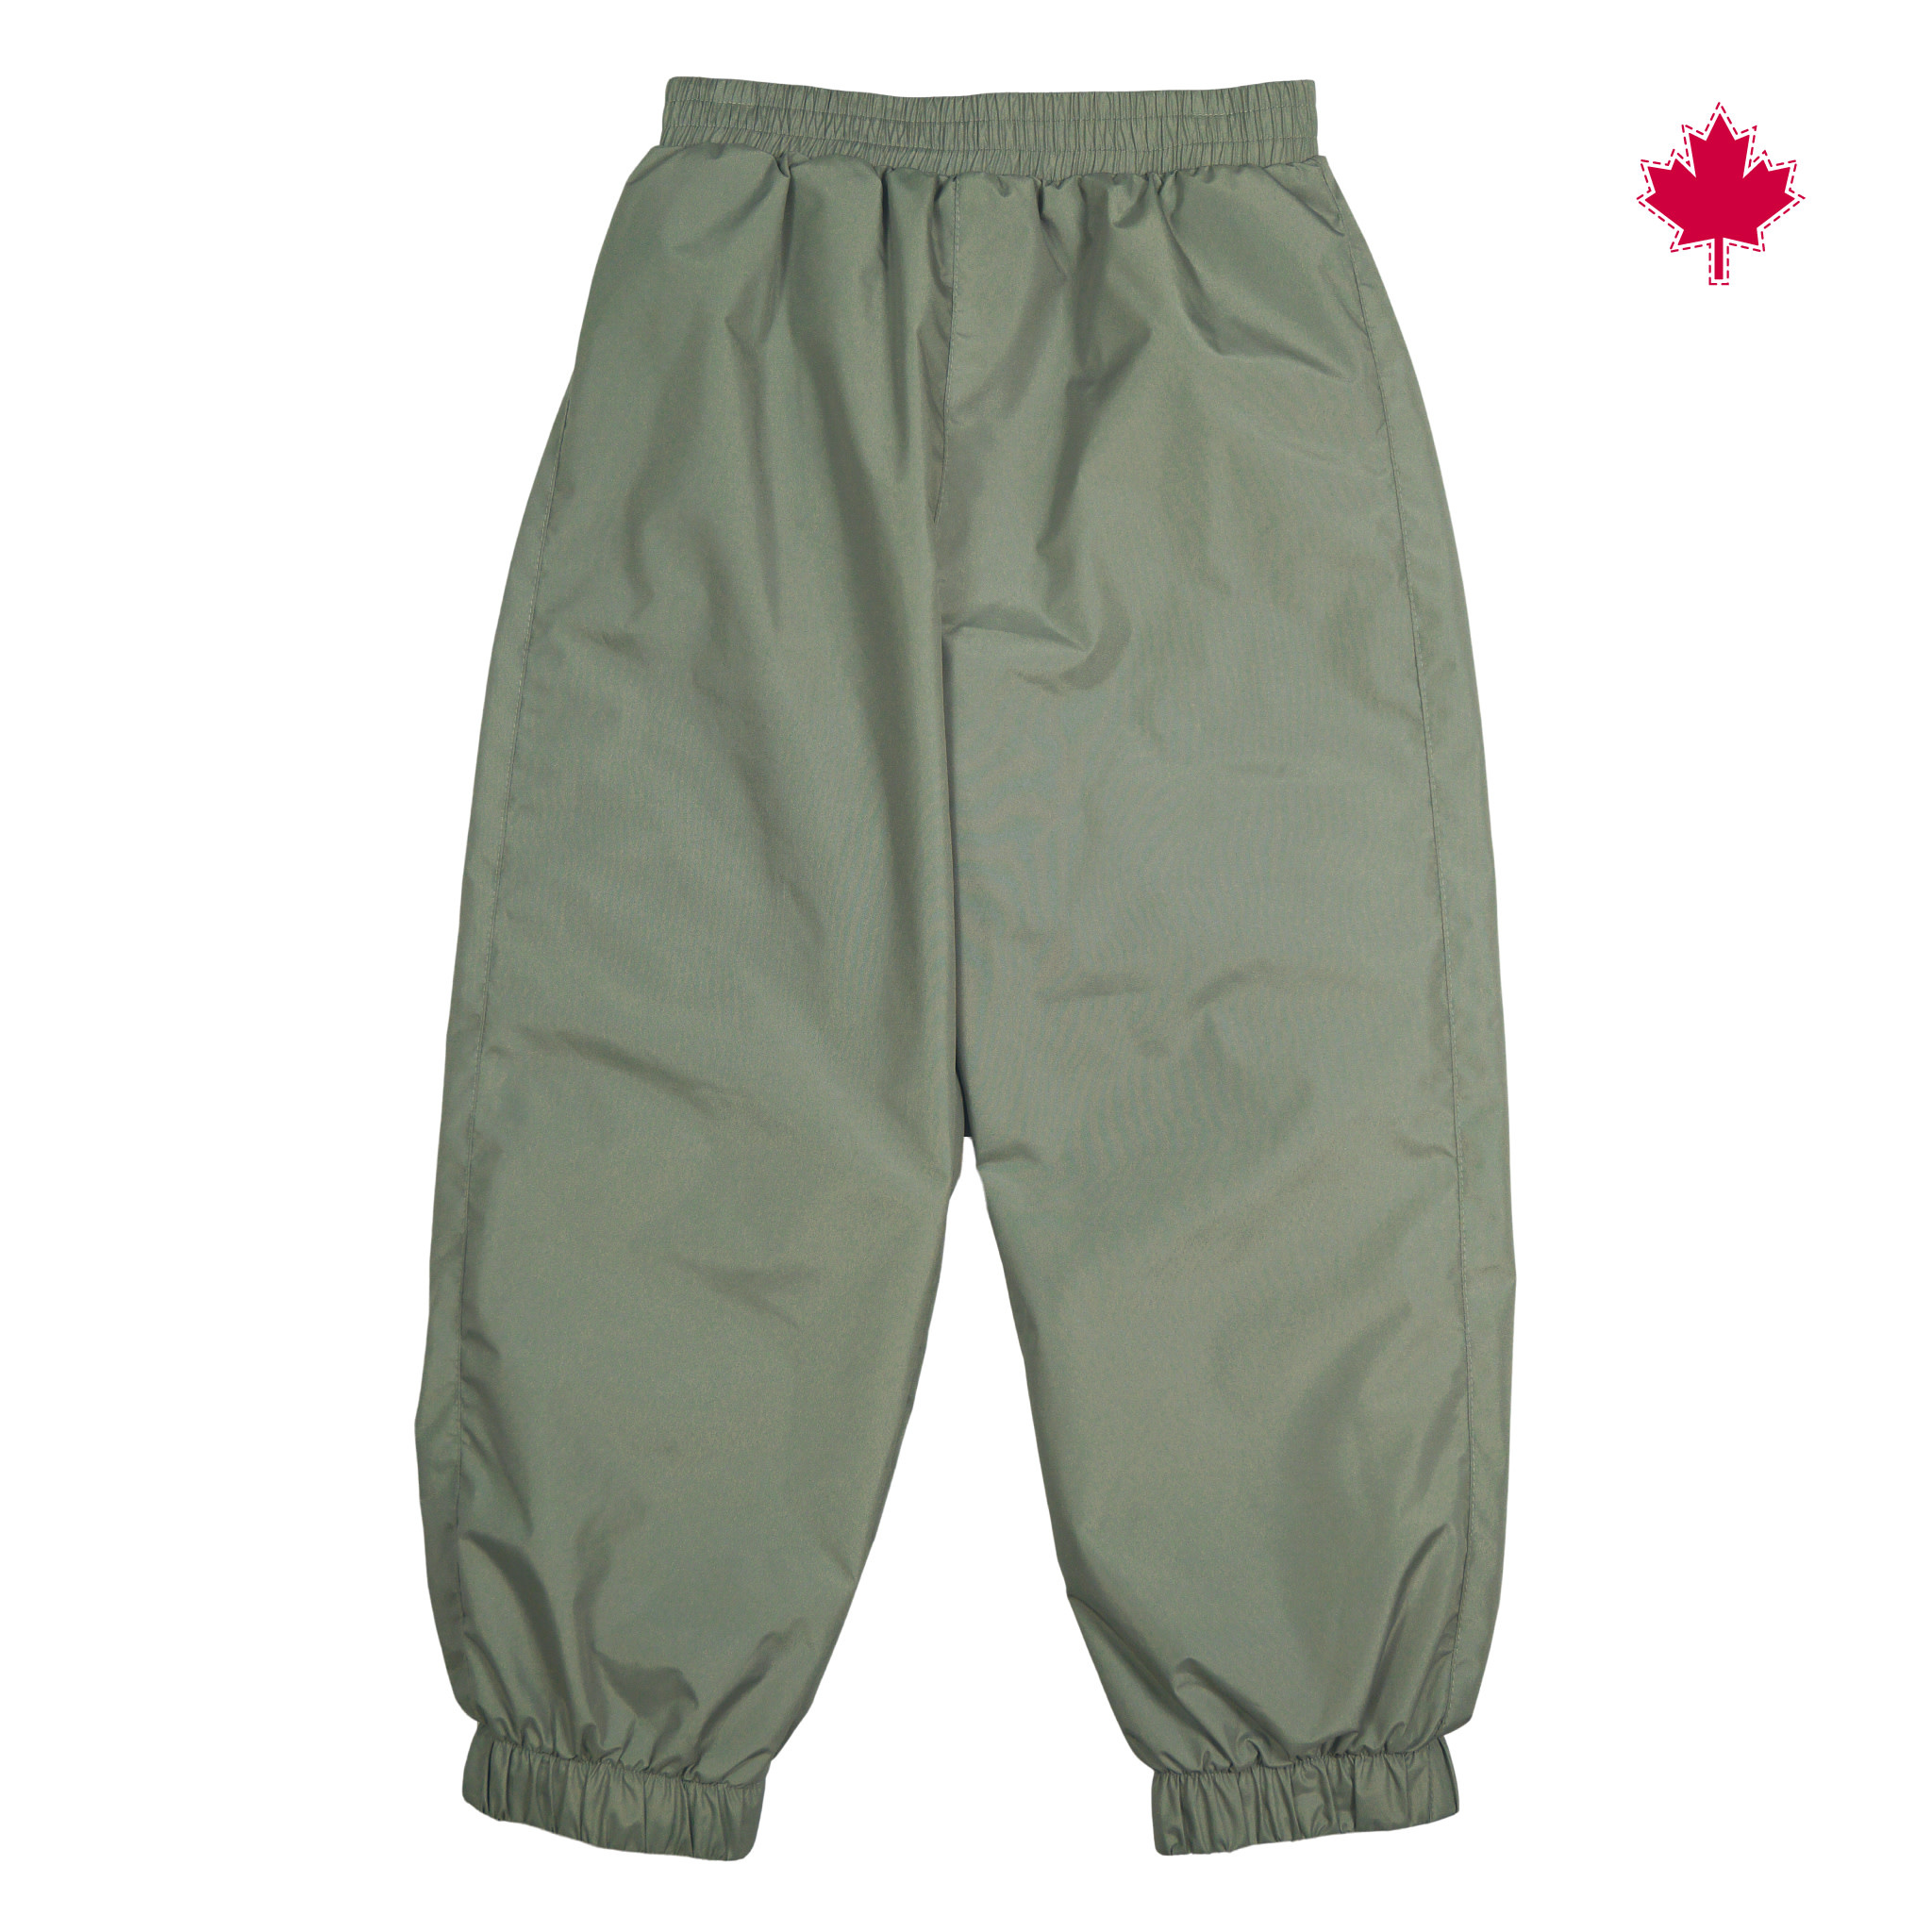 Pantalons mi-saison Taffeta - Kaki-1